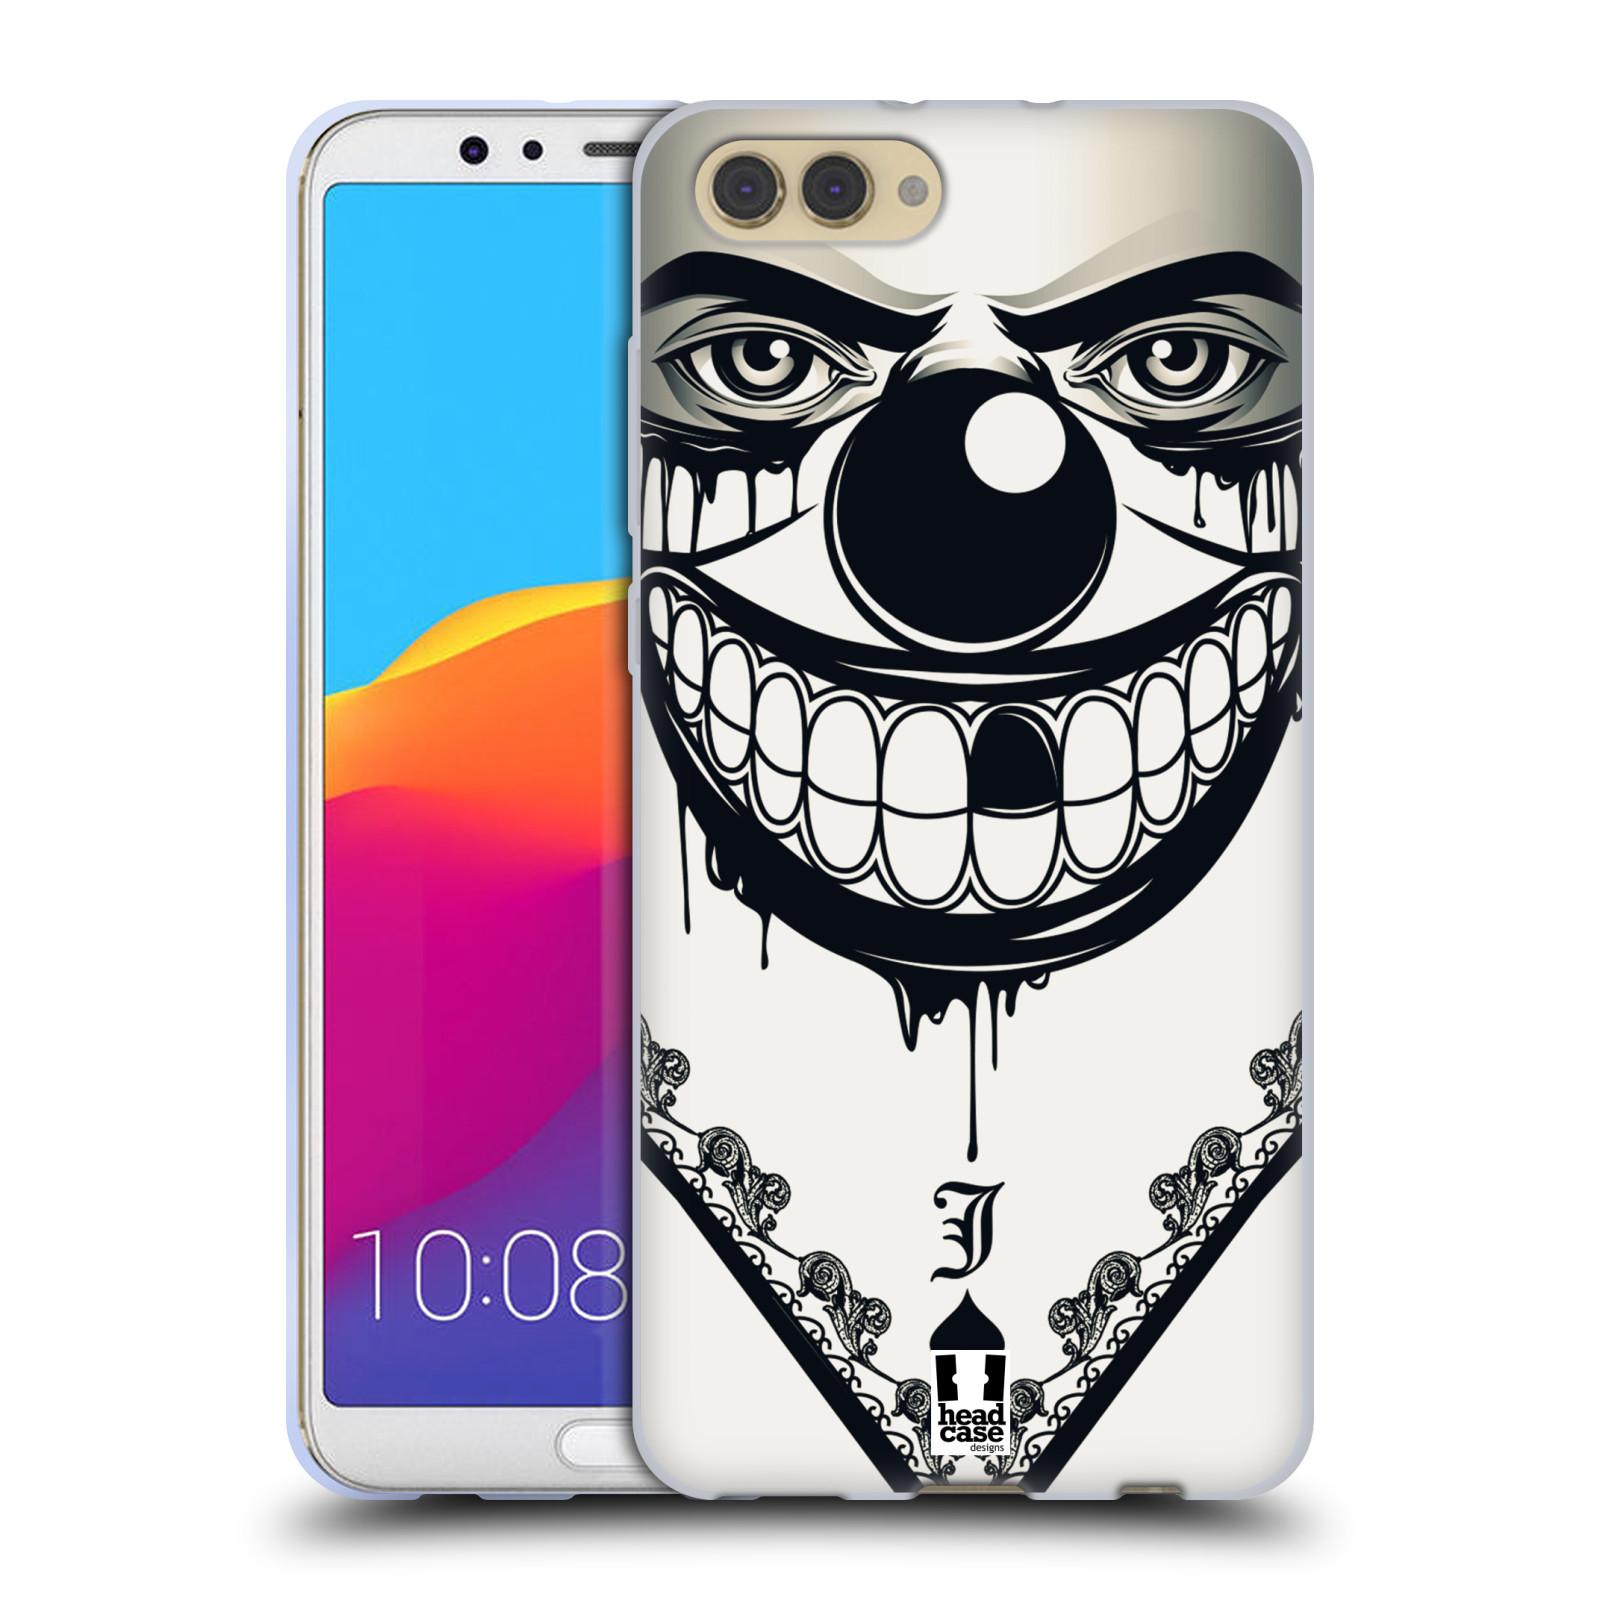 Silikonové pouzdro na mobil Honor View 10 - Head Case - ZLEJ KLAUN